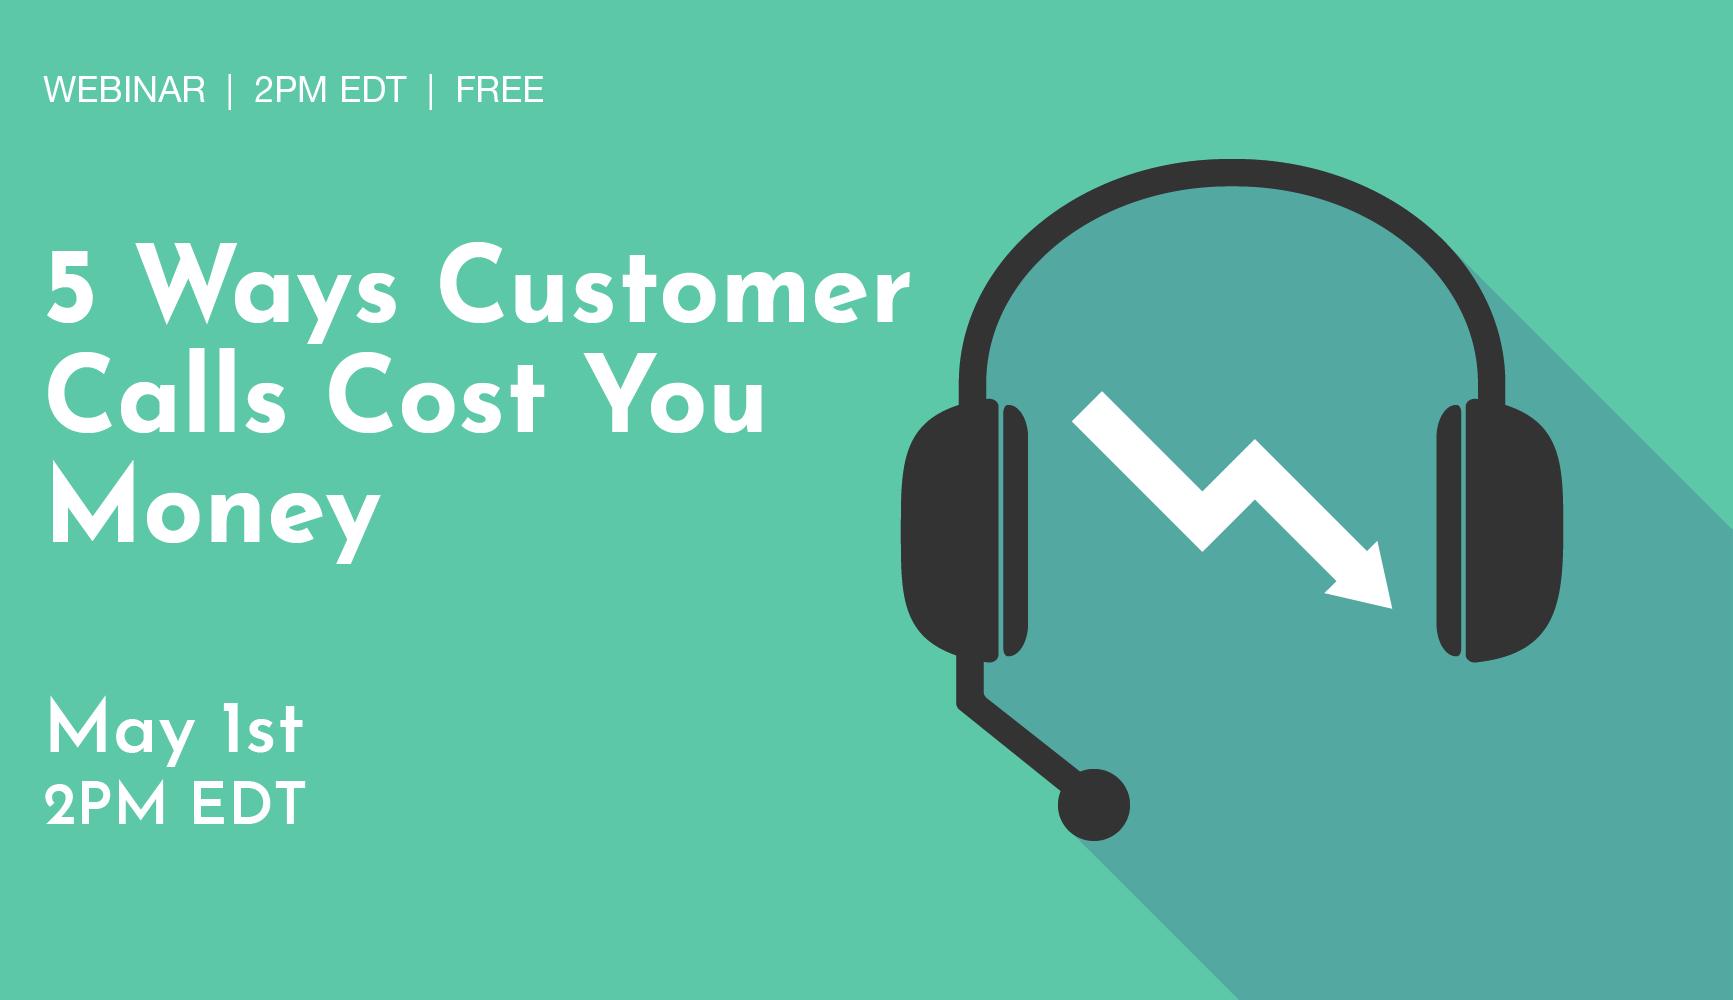 5 Ways Customer Calls Cost You Money-01 (1)